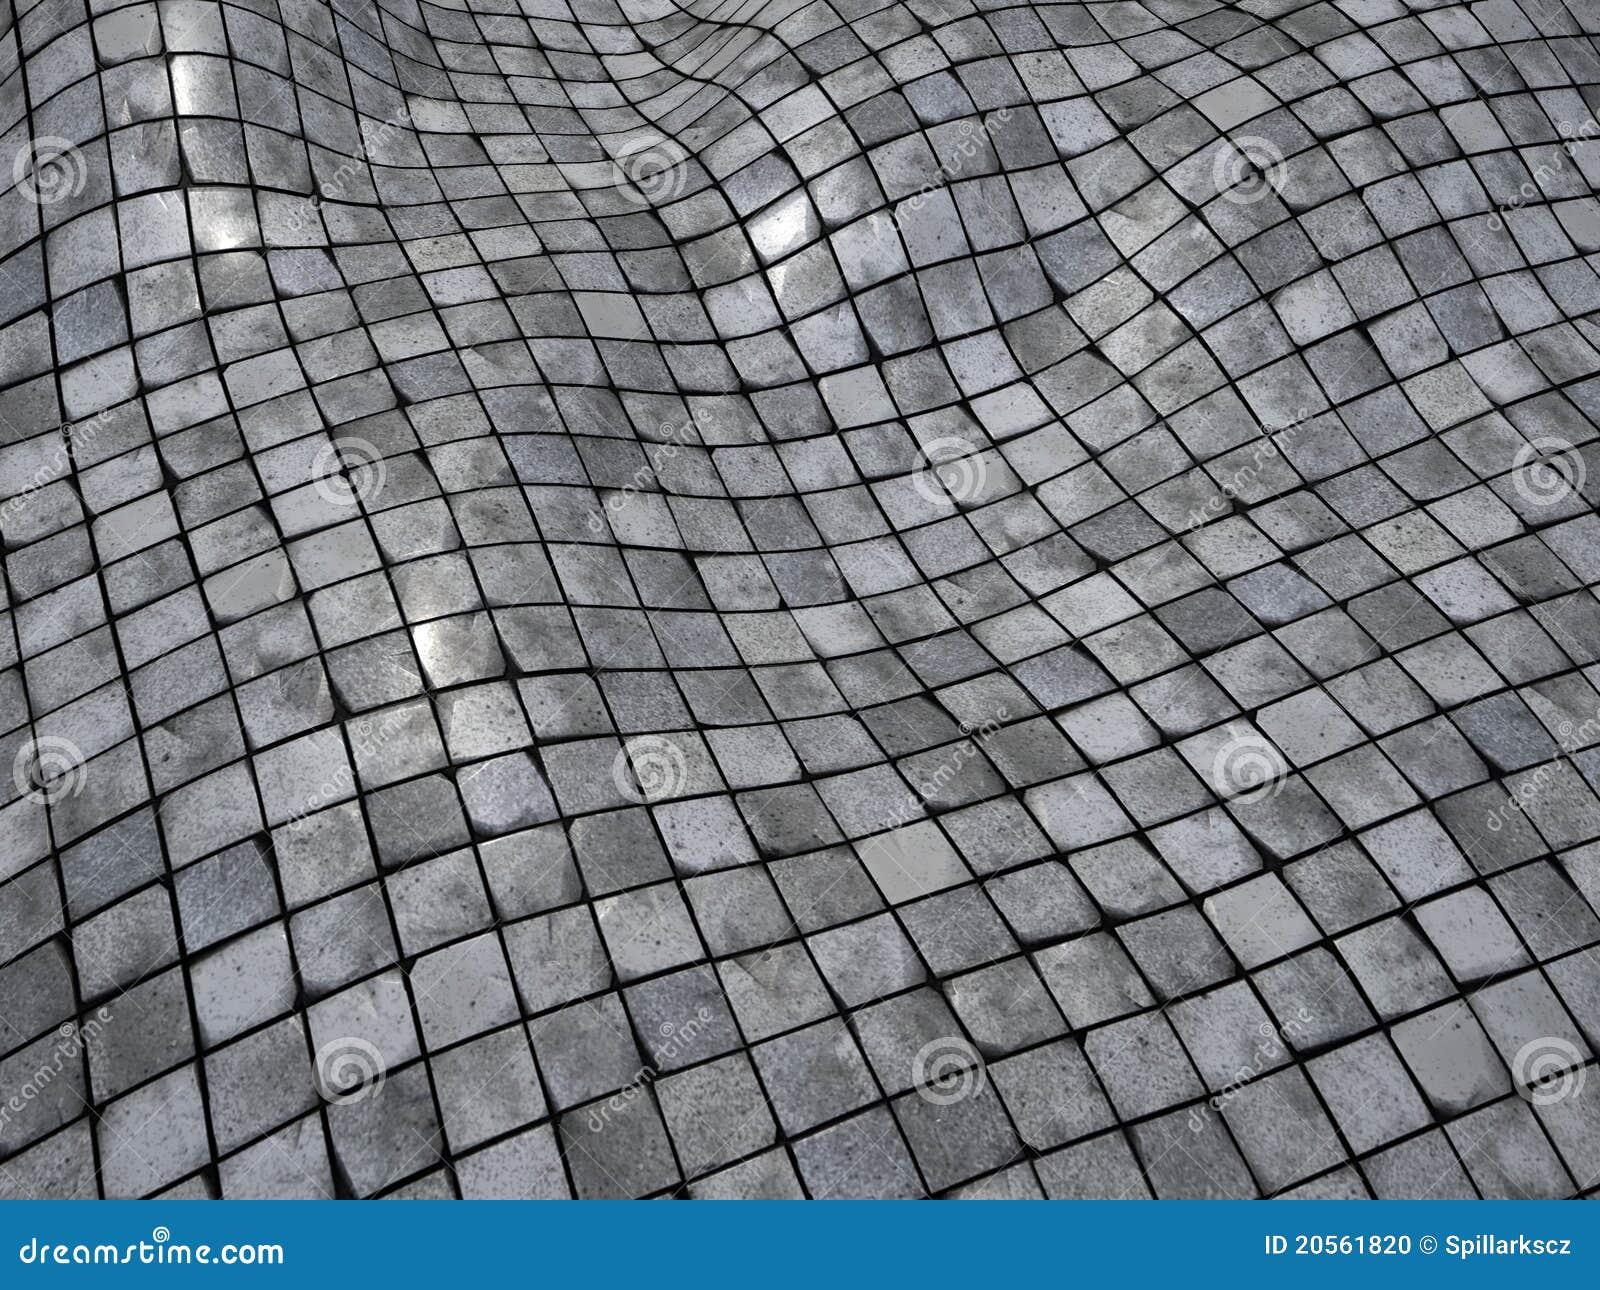 3d Render Wobble Mosaic Tile Floor Wall Surface Stock Photo - Image ...